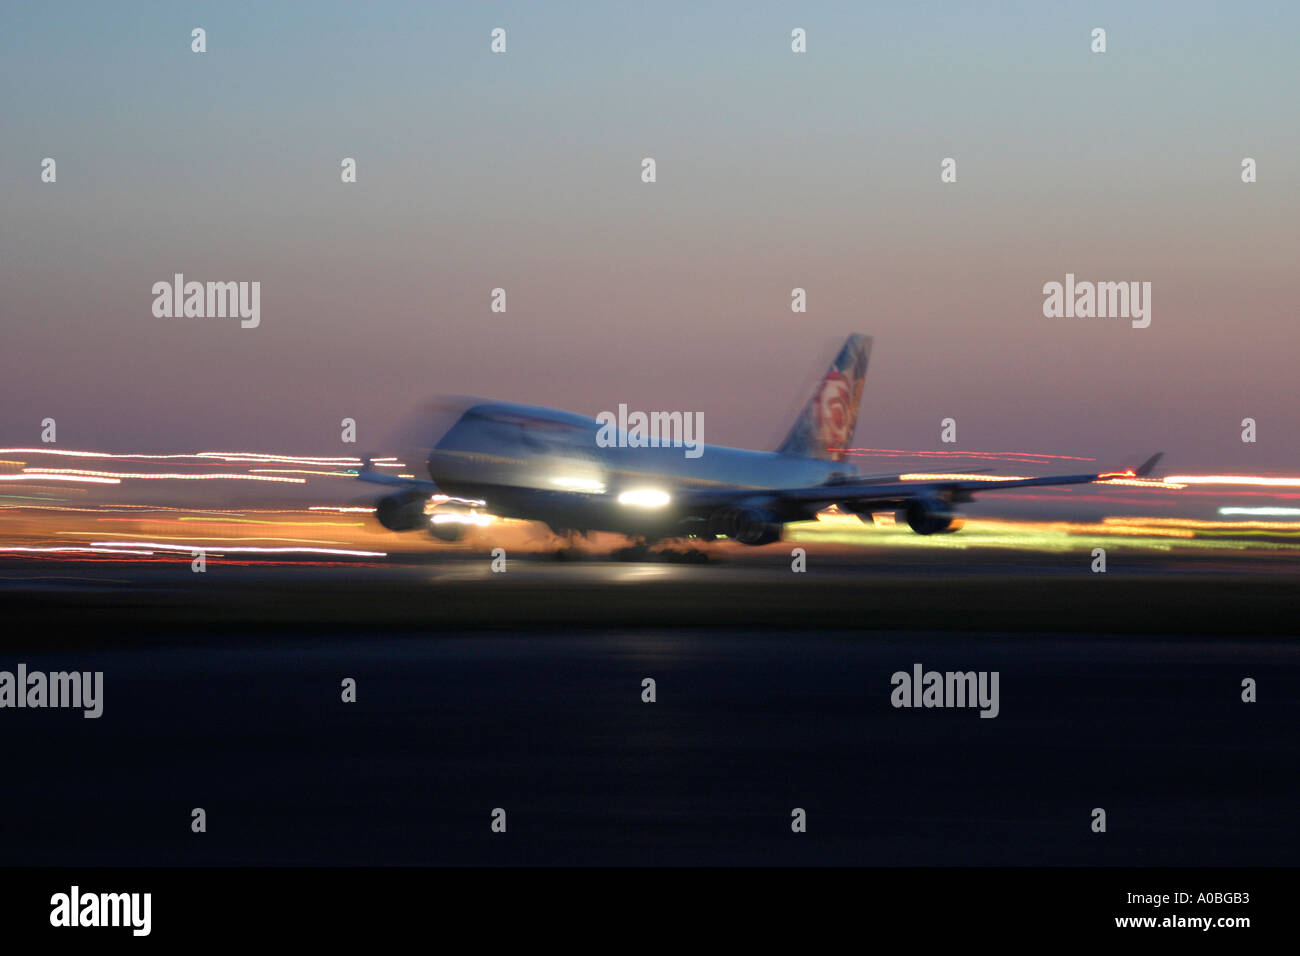 British Airways Boeing 747 taking off at London Heathrow Airport UK - Stock Image